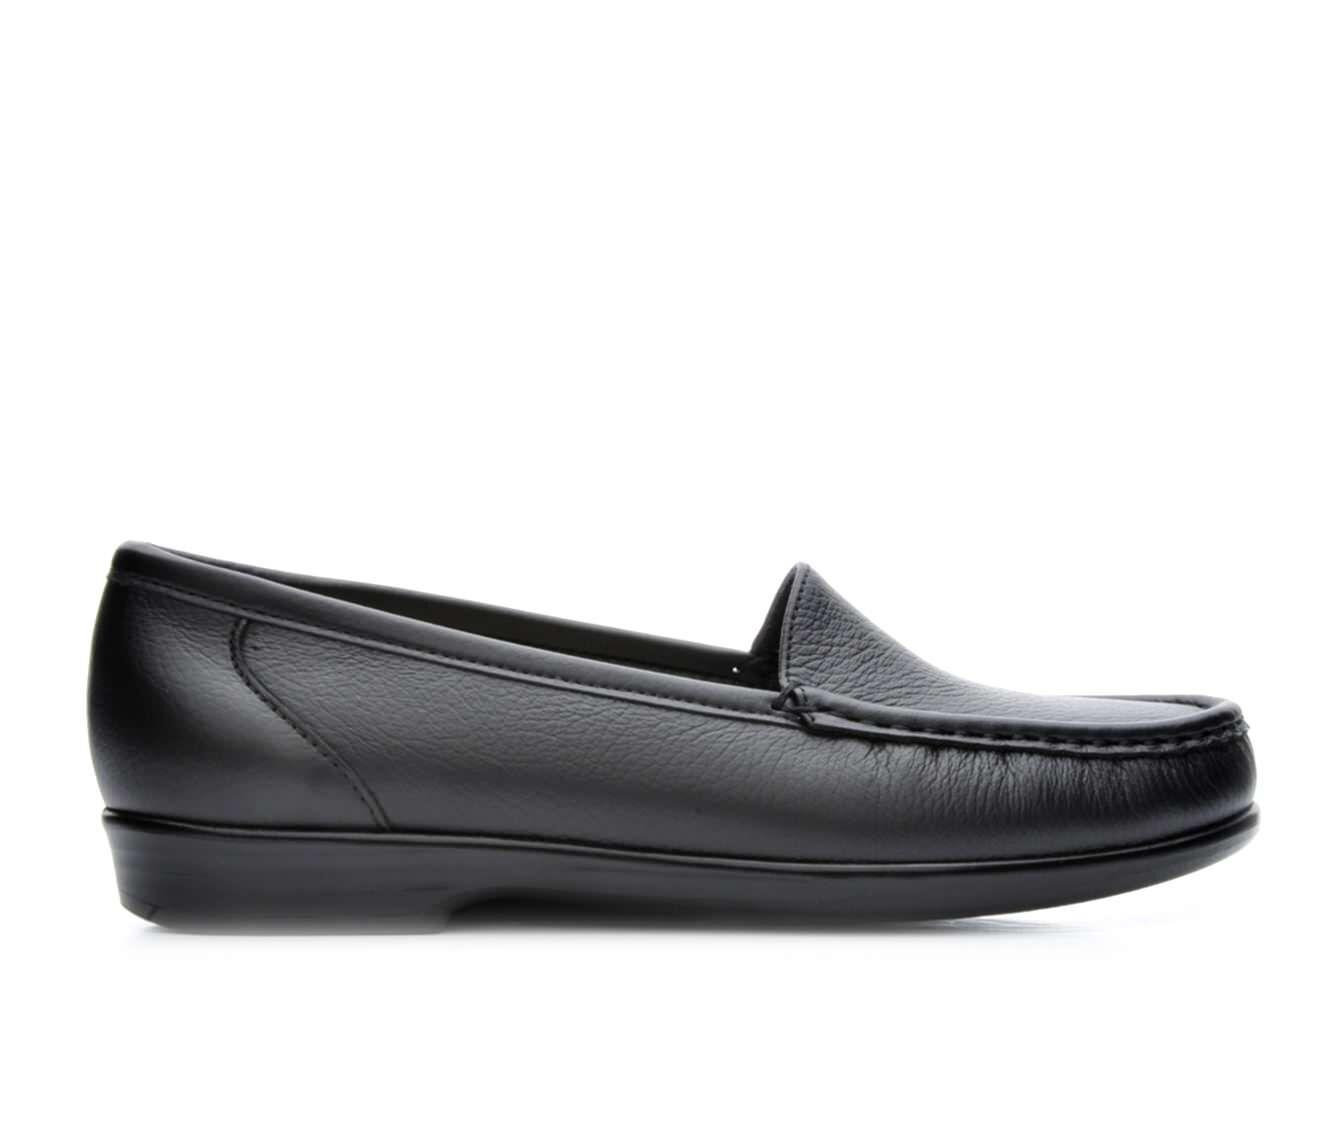 Women's Sas Simplify Loafers Black